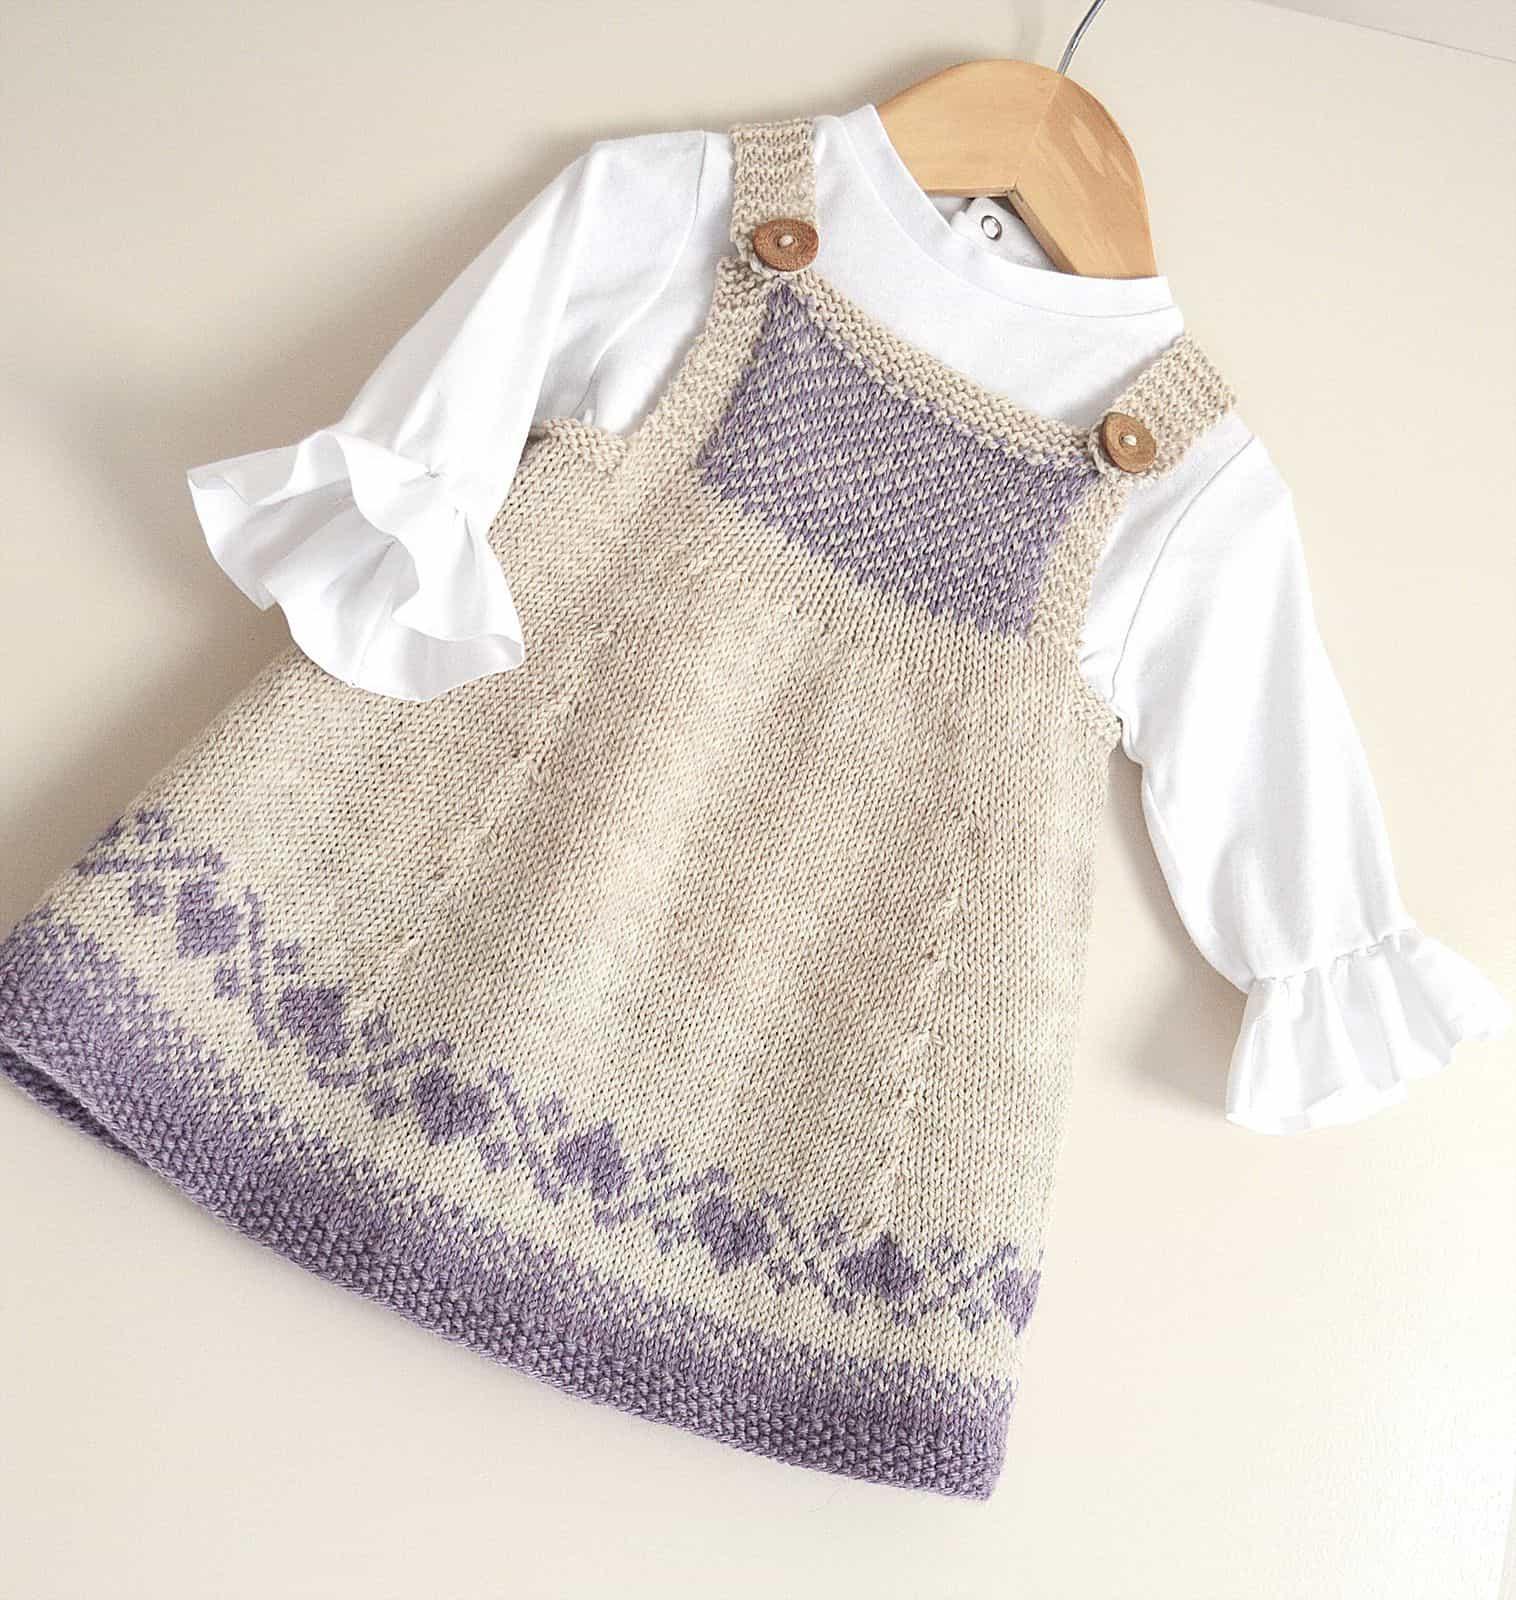 Beyond Winter: 15 Pretty Knitting Patterns for Summer Babies